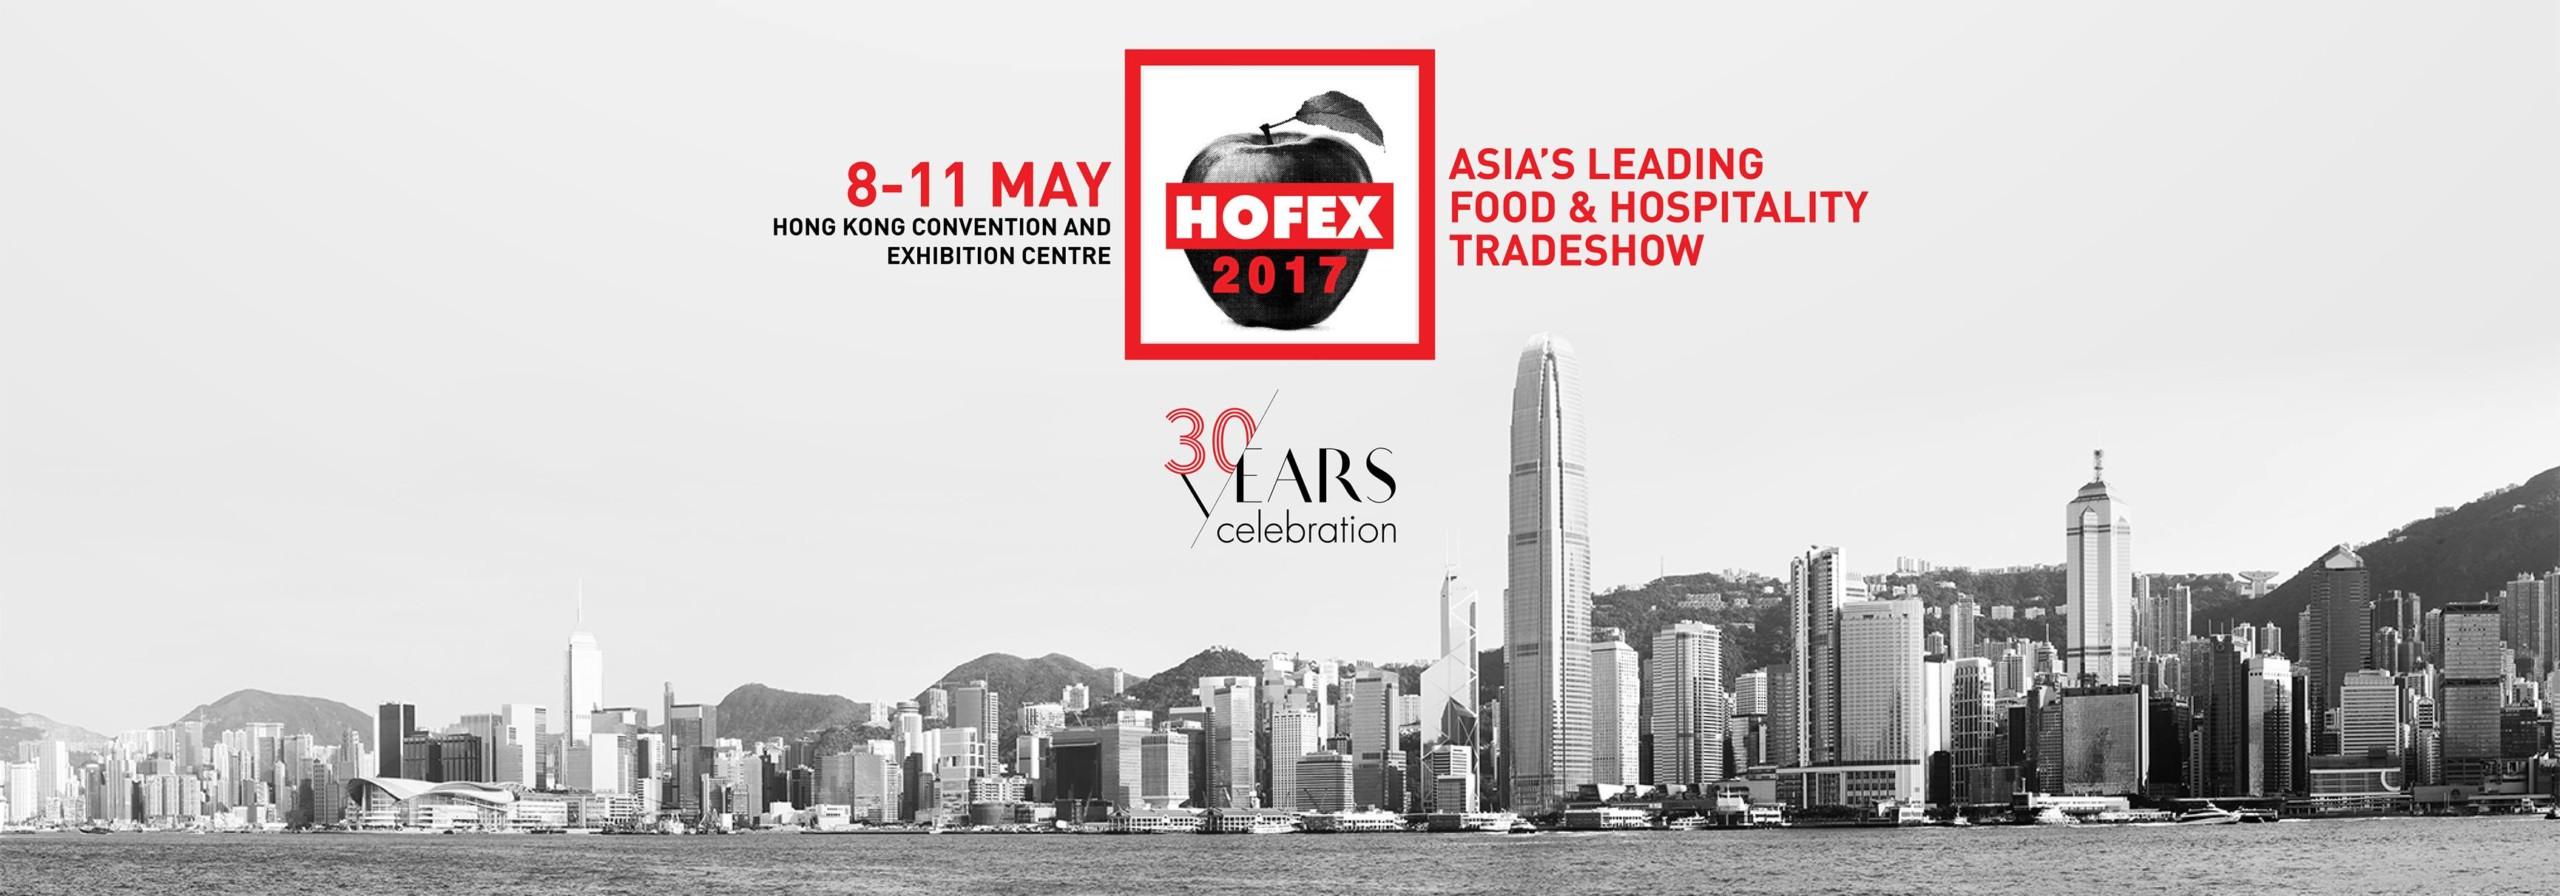 HOFEX 2017 Hong Kong